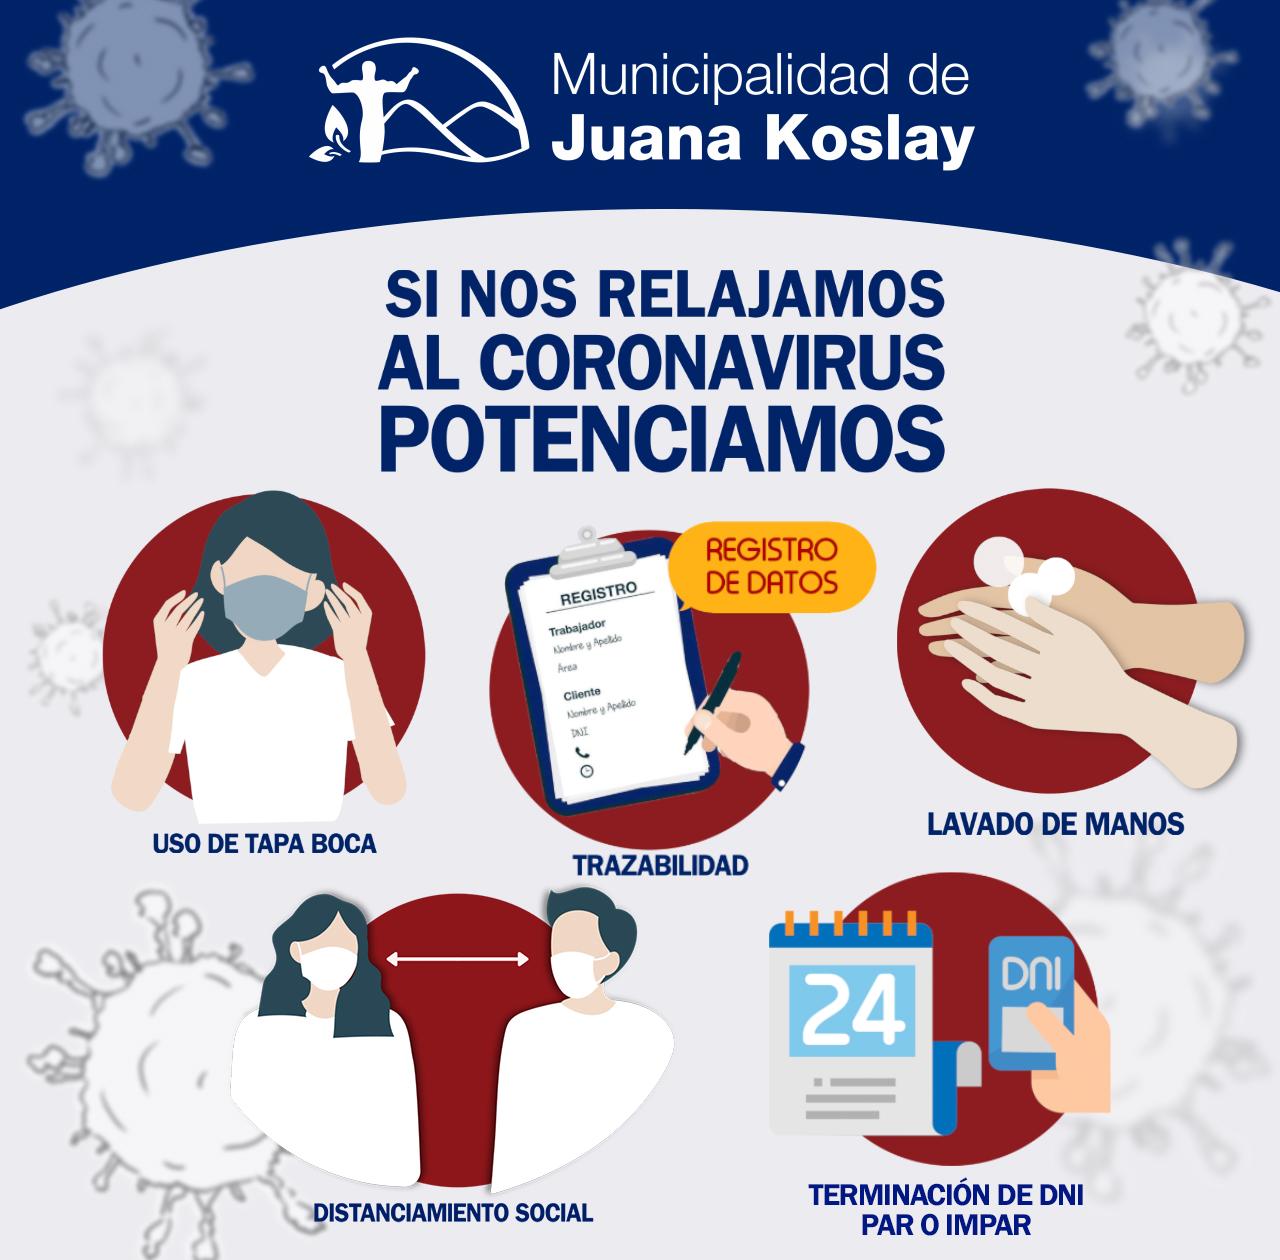 Municipalidad de Juana Koslay